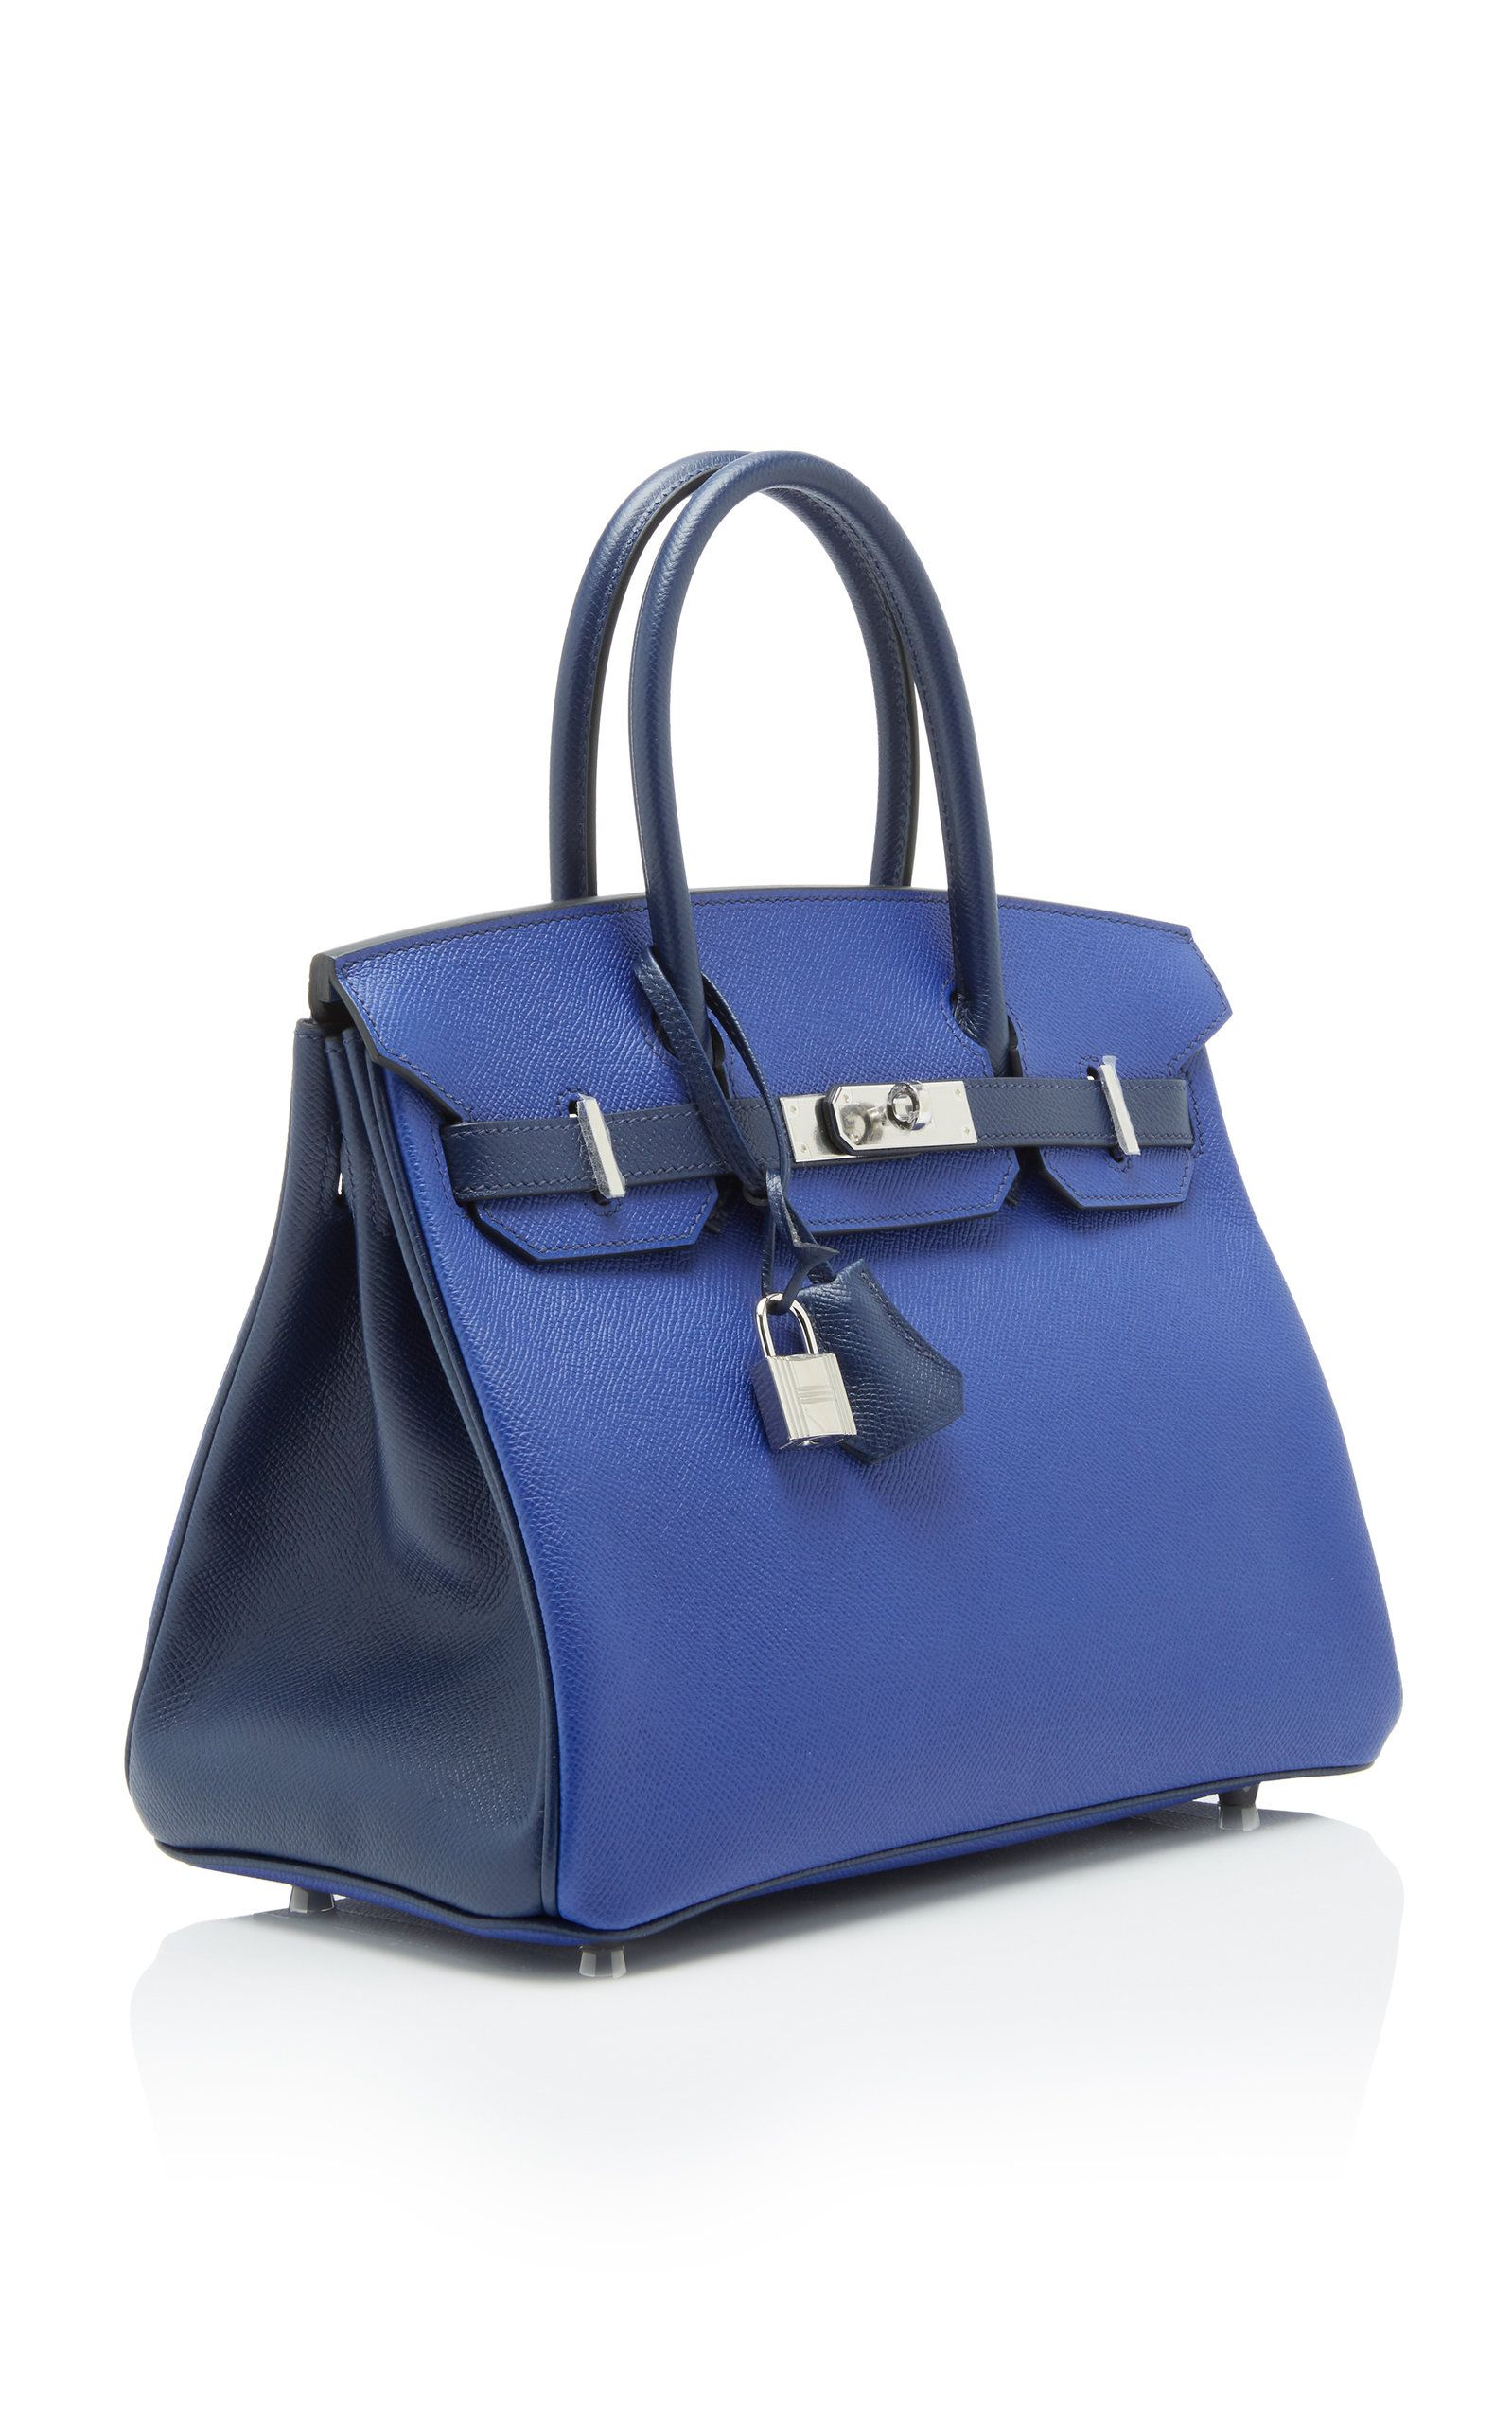 cb5e22c47221 Hermes 30cm Blue Electric and Blue Saphir Epsom Leather Birkin ...